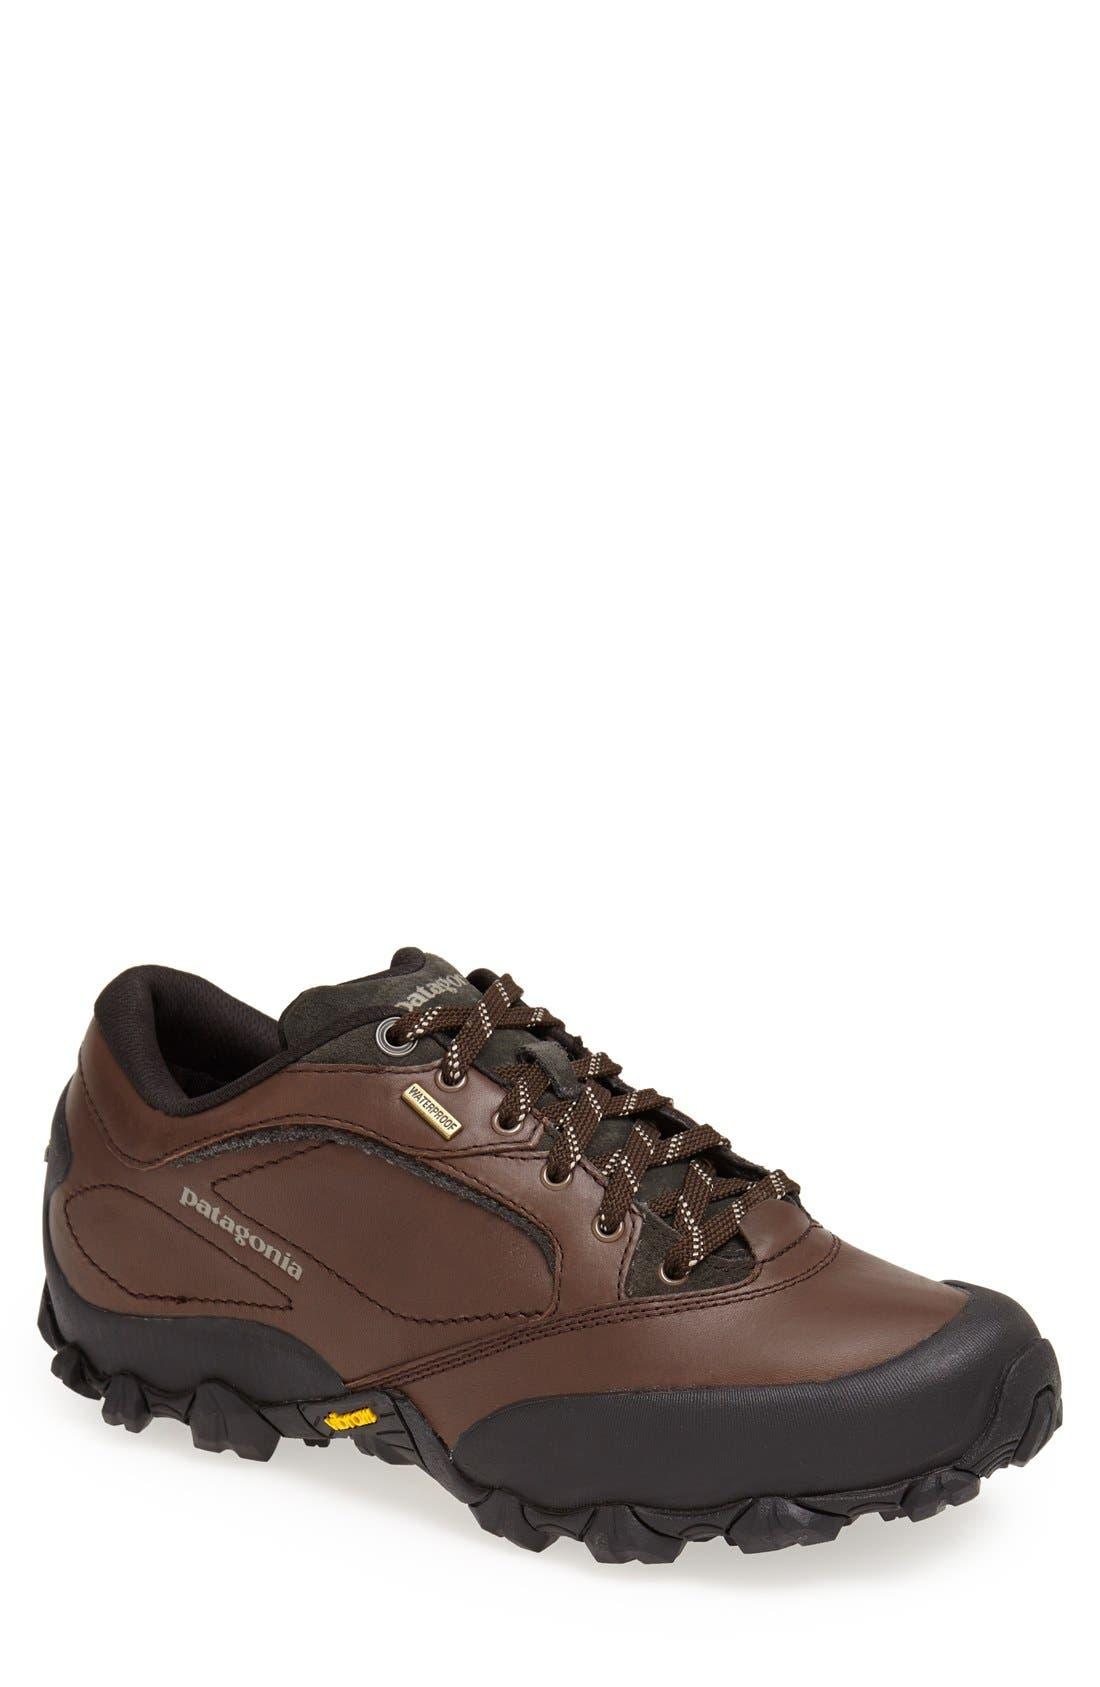 Alternate Image 1 Selected - Patagonia 'Drifter 2.0' Waterproof Hiking Shoe (Men)